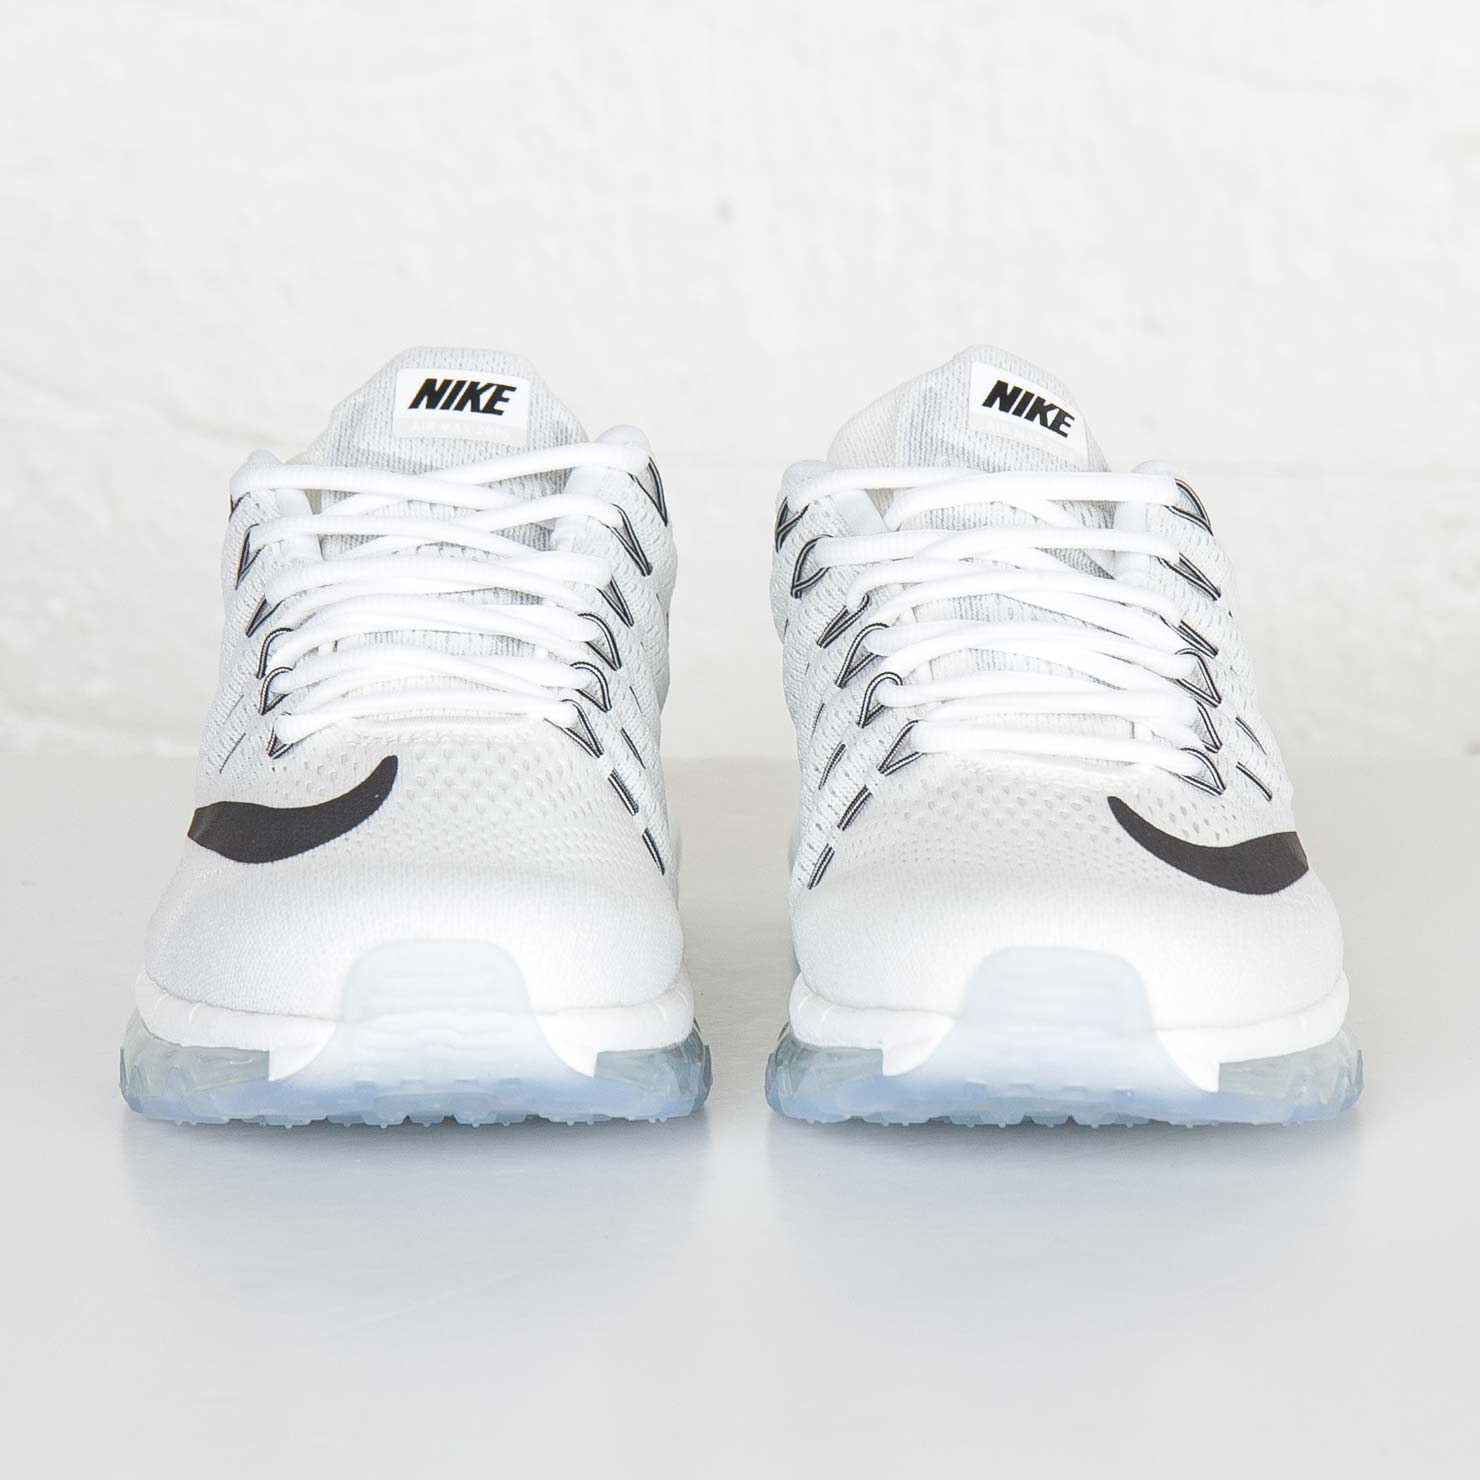 super popular 3aa70 66d00 Nike Air Max 2016 - 806771-100 - Sneakersnstuff   sneakers   streetwear  online since 1999